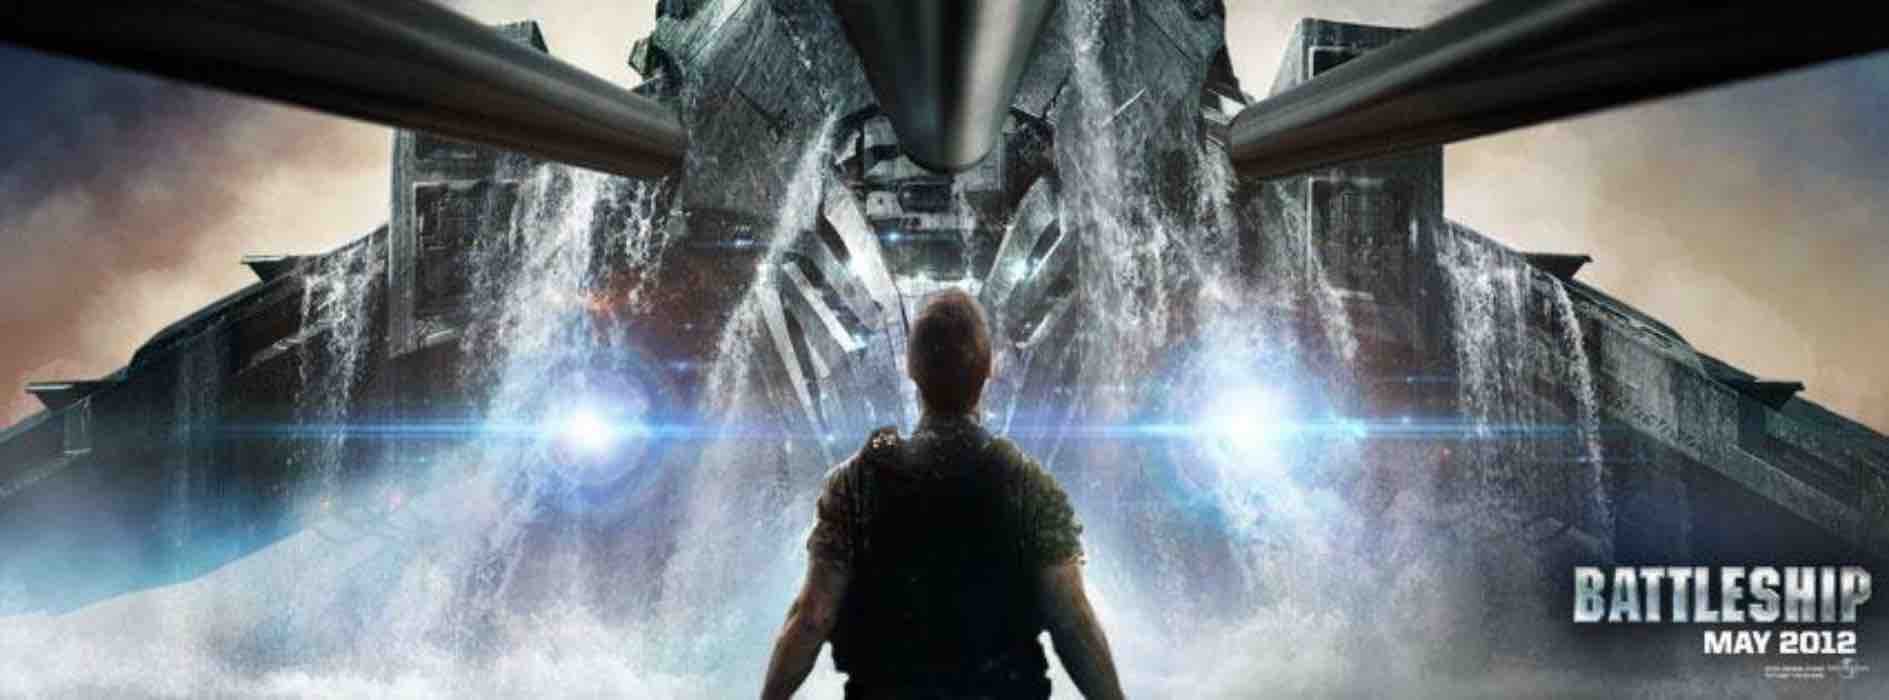 Battleship: trama, info e curiosità sul film con Rihanna